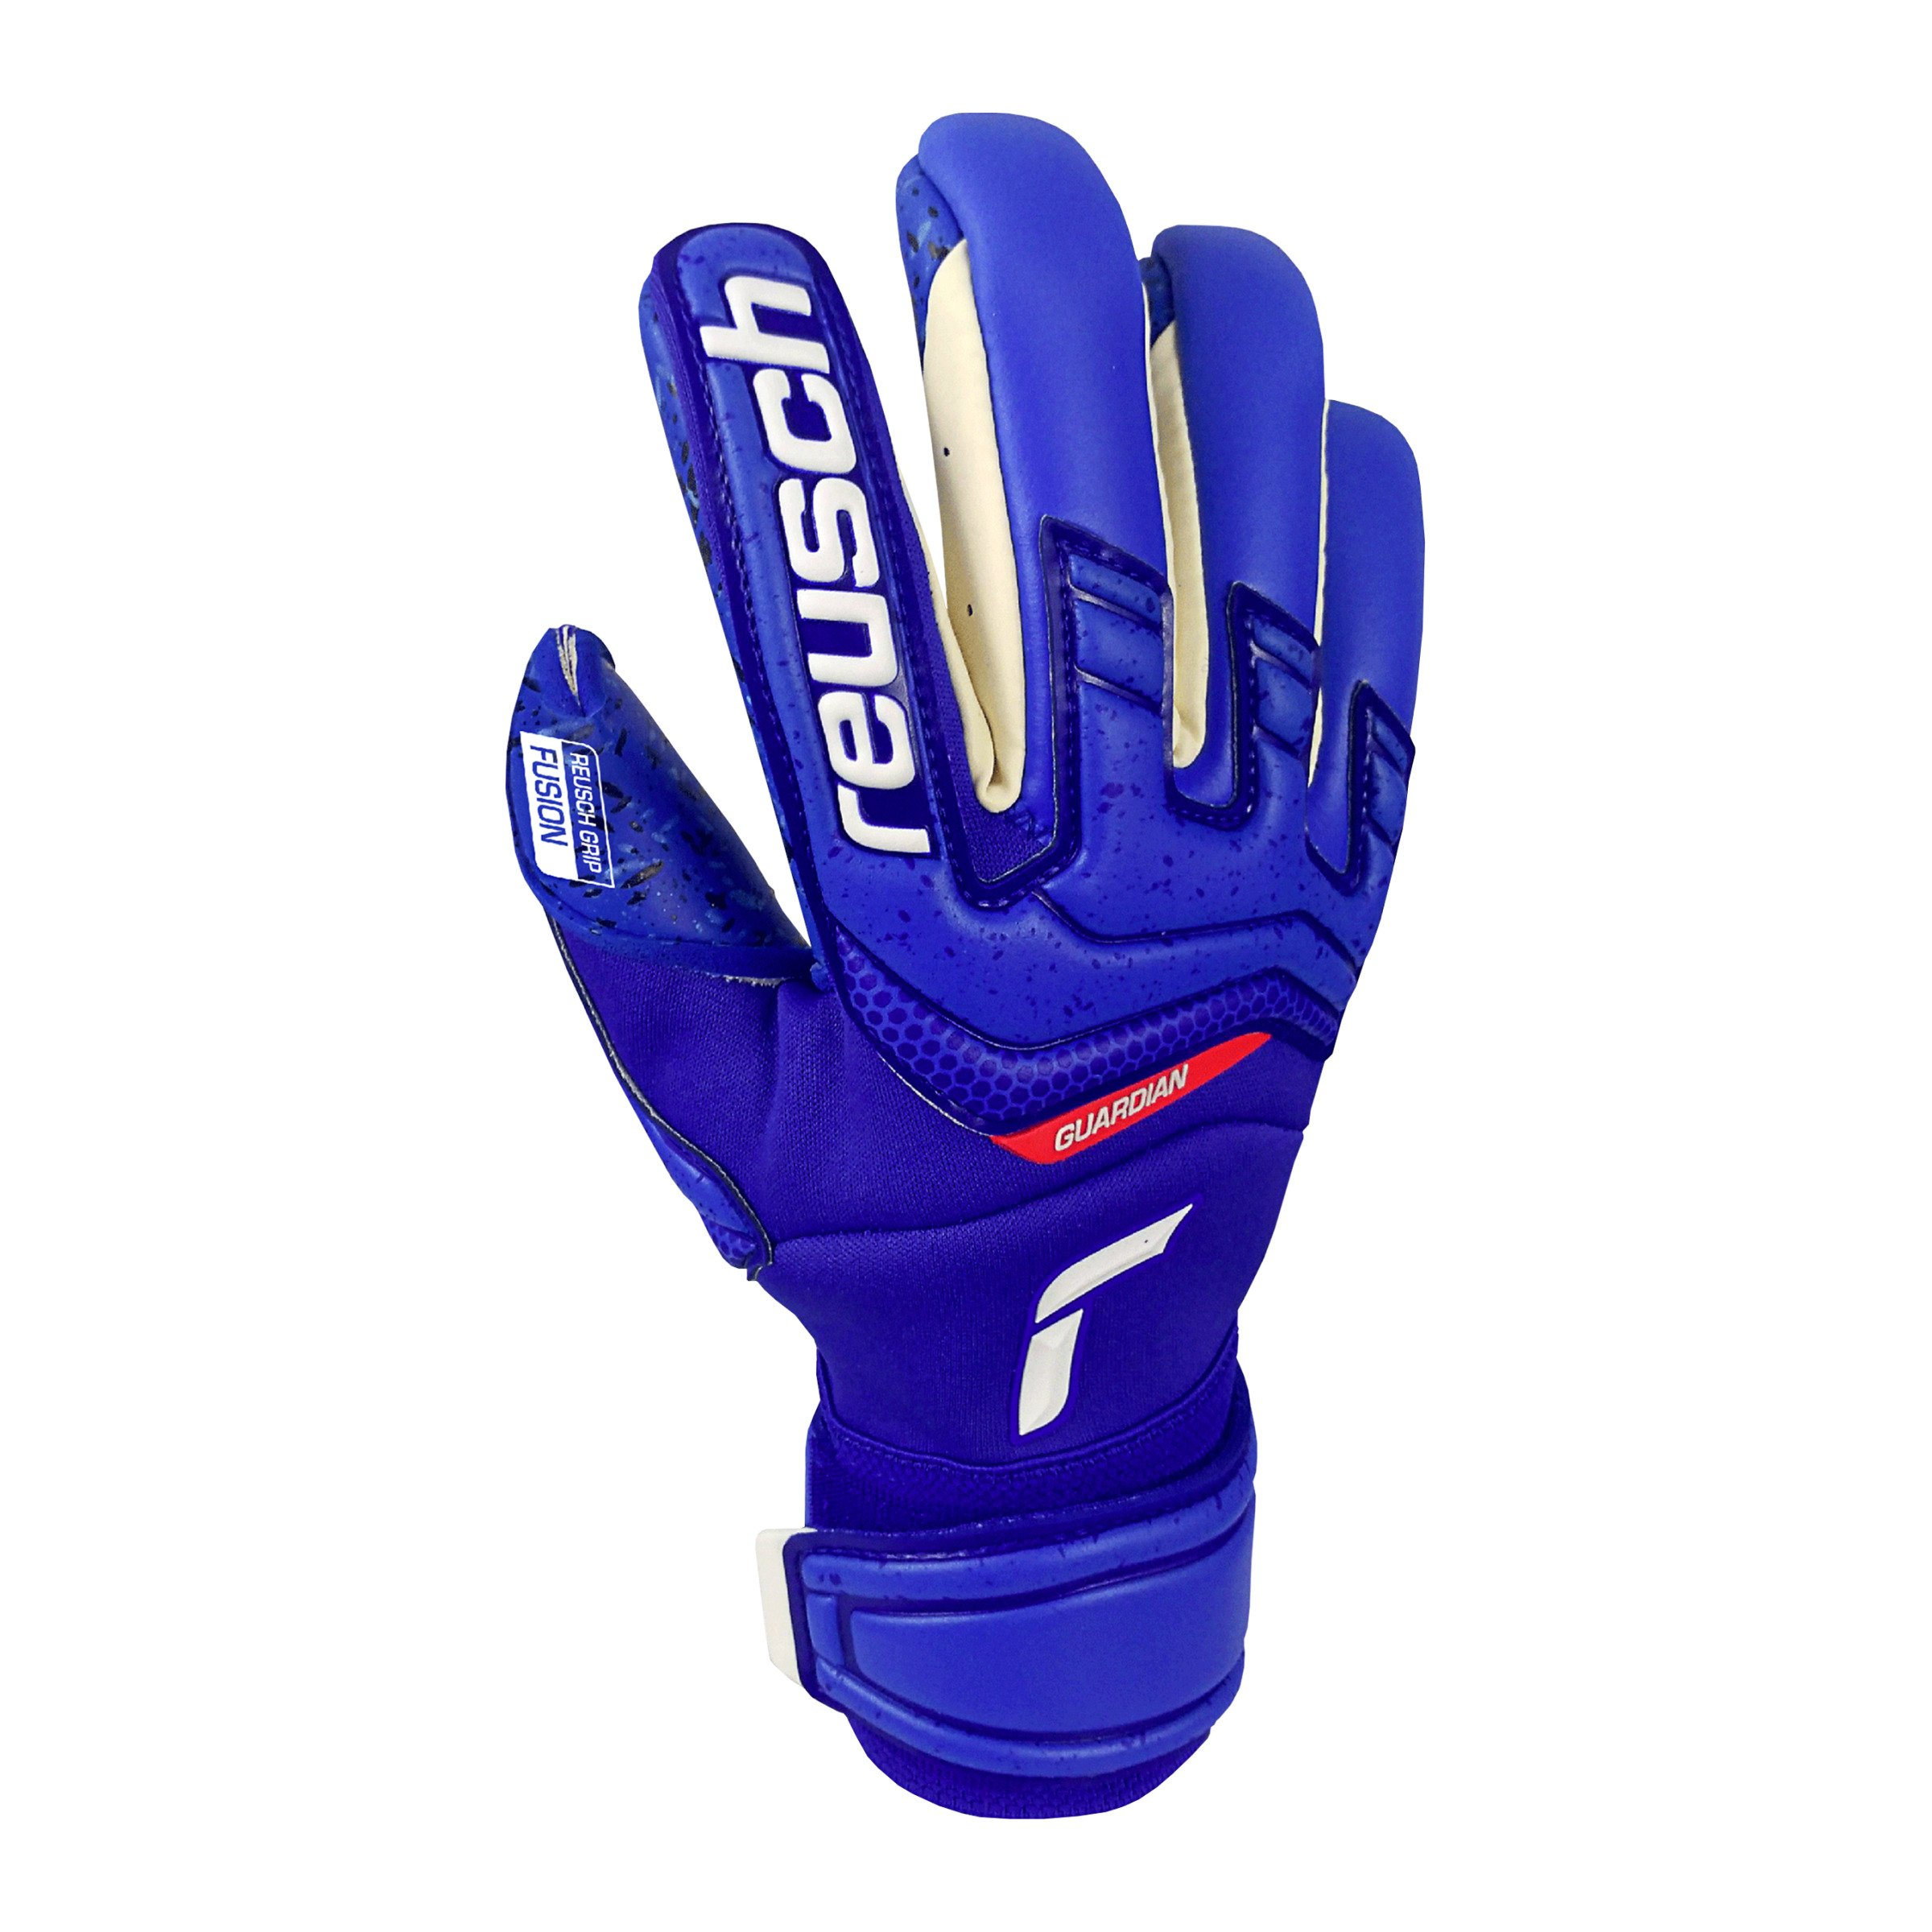 Reusch Attrakt Fusion Guardian TW-Handschuh F4010 - blau